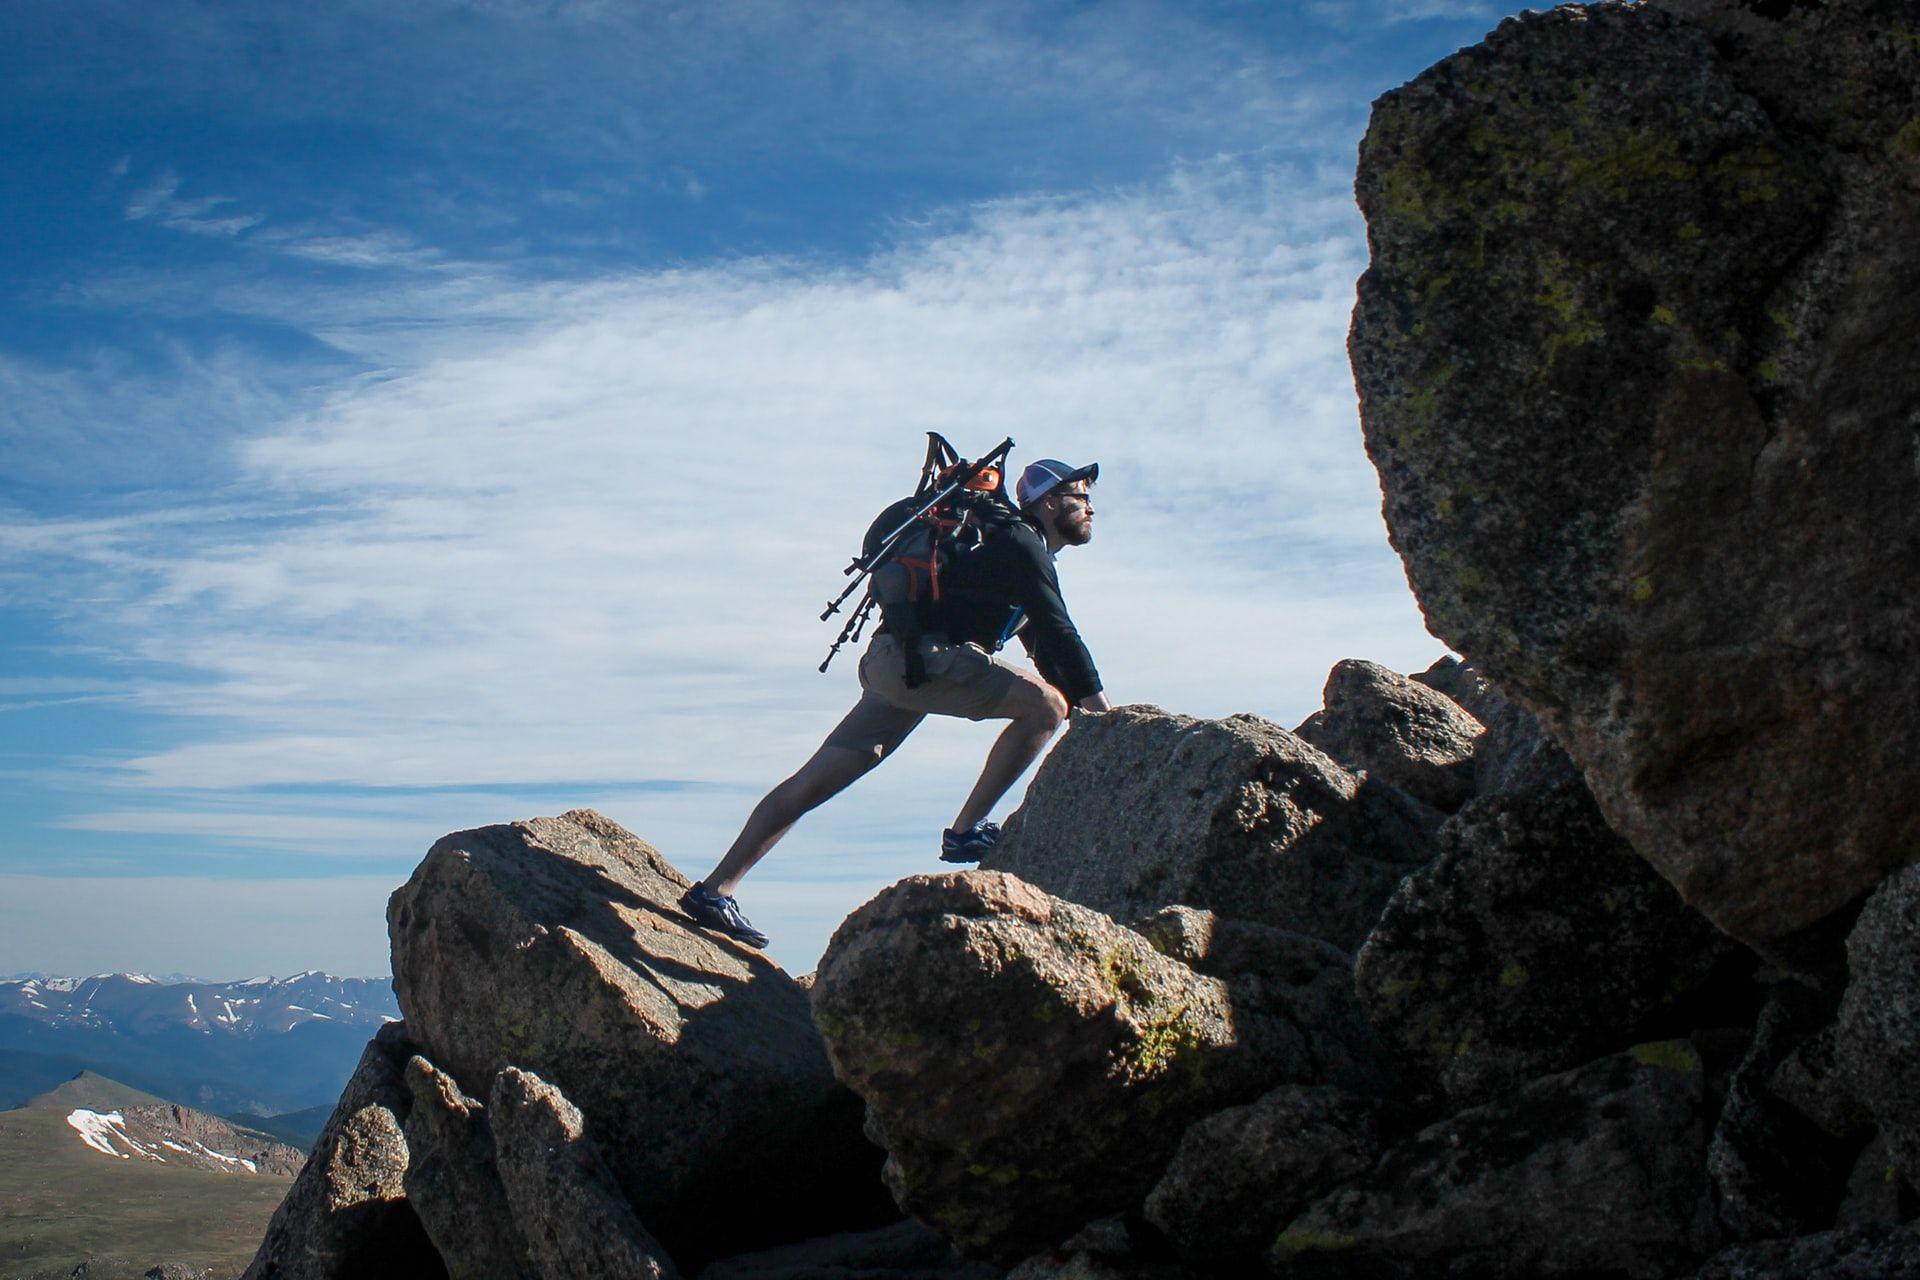 Man climbing rocks learning and development